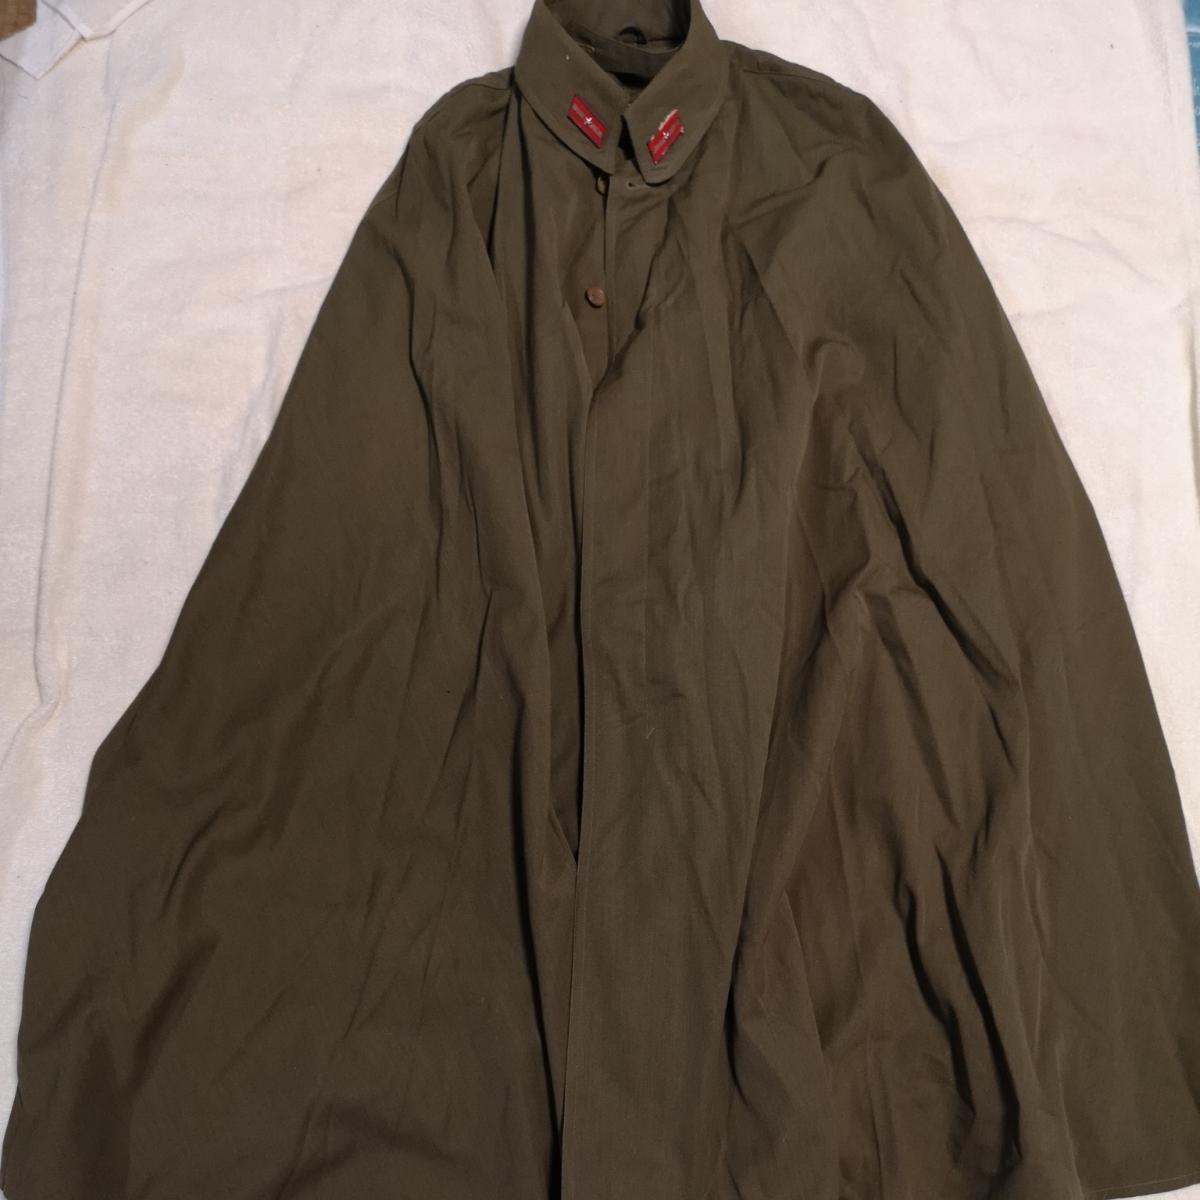 日本軍 将校マント 少尉 外套 襟章付き 戦前 洋品店仕立 軍服